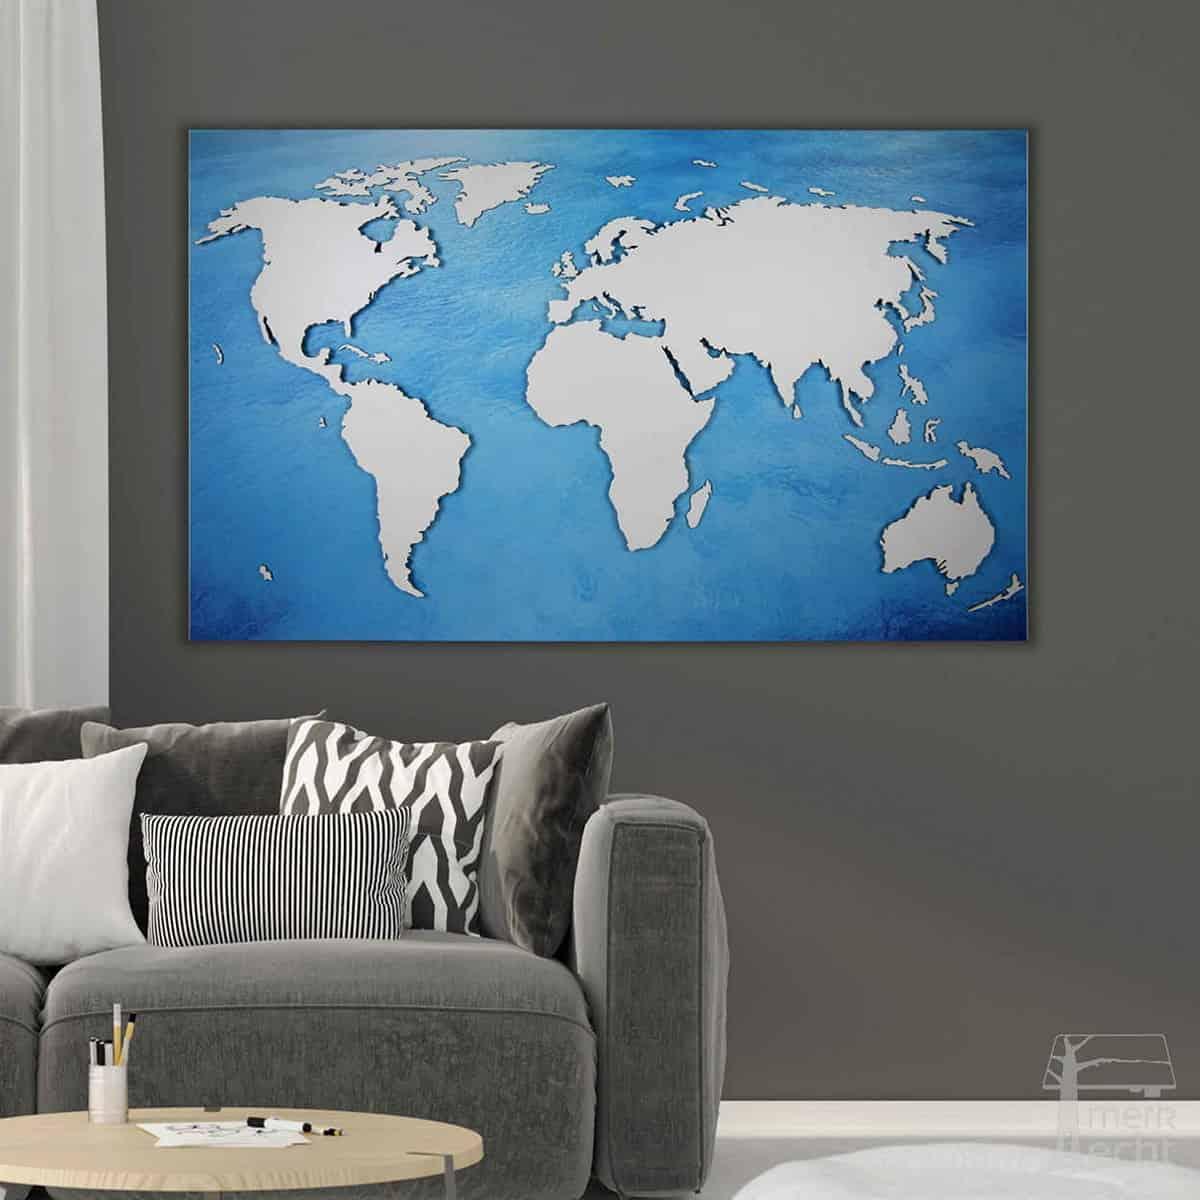 Weltkarte-Franklin-Wasser-WeltkarteHolz-Wandbild-Beleuchtet-WeißesKontinente-Holz-Welt-Karte-XXL-WelkartenAusHolz-WeißeKontinente-KontinenteHolz